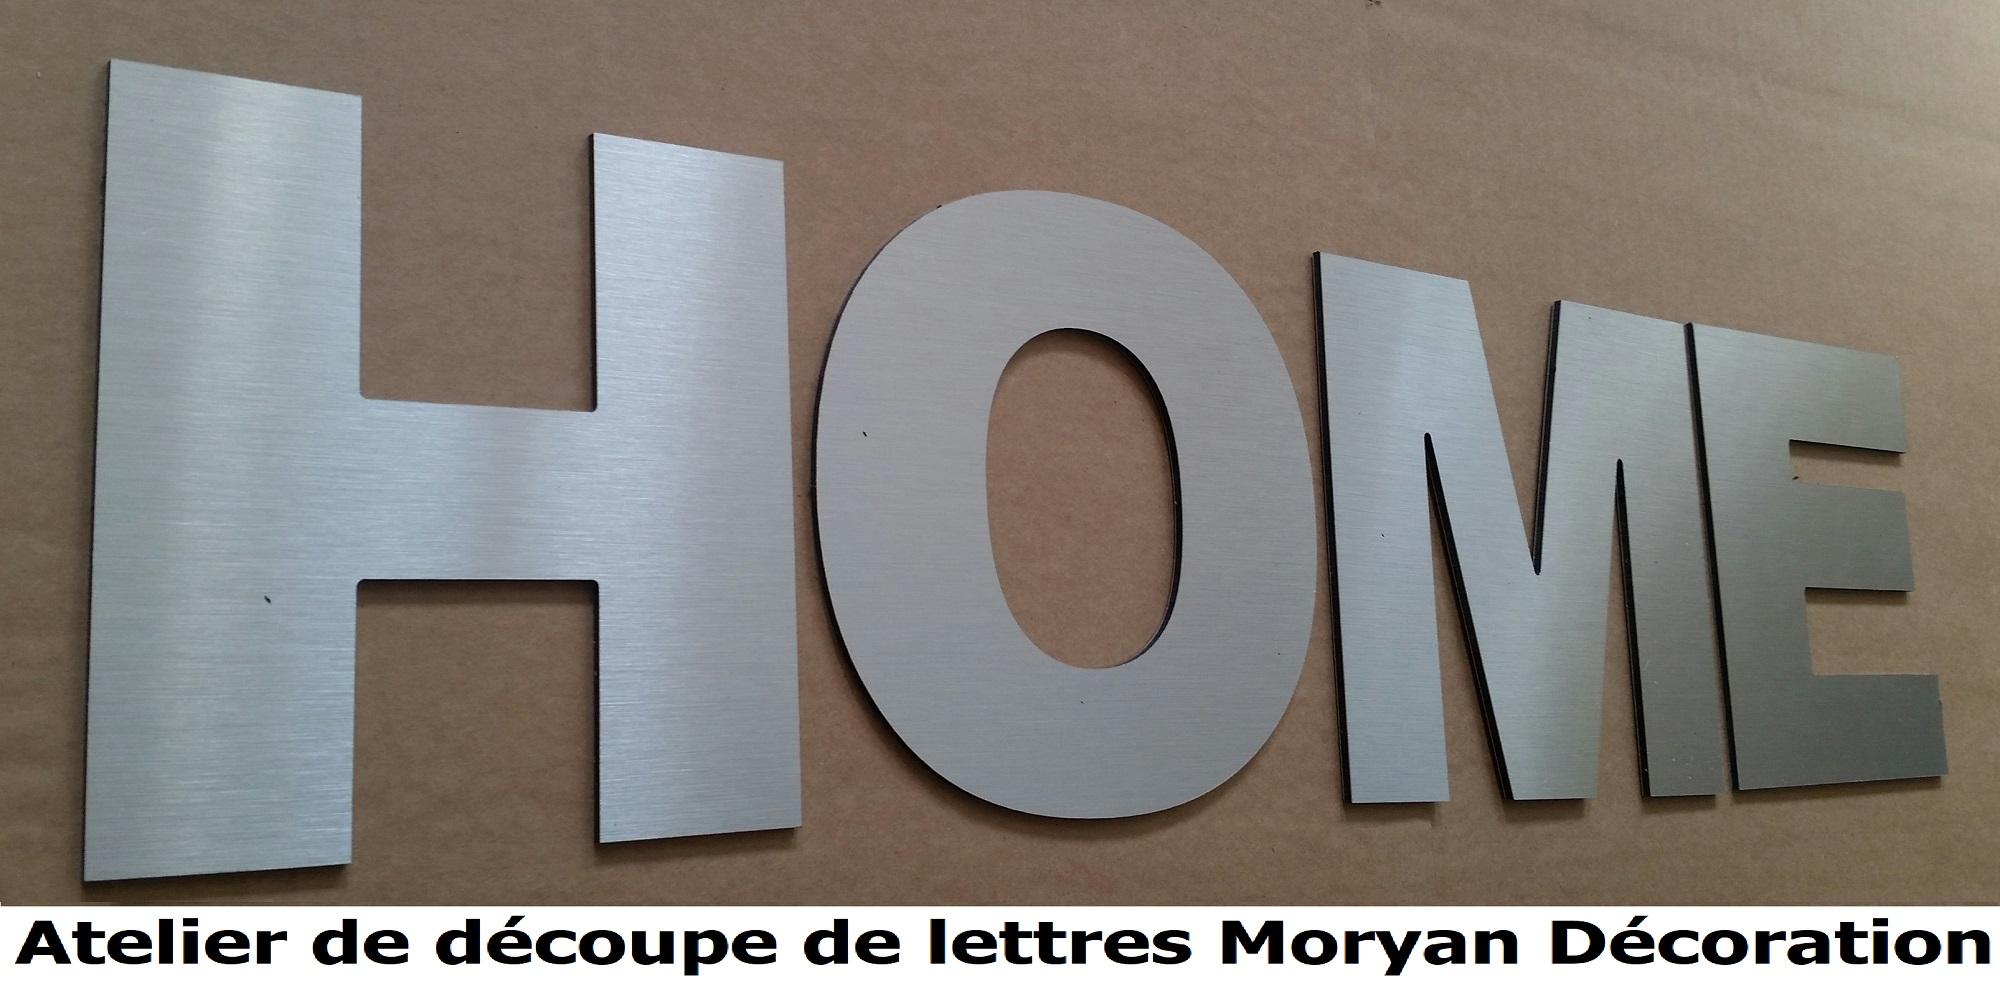 Lettre deco HOME 1